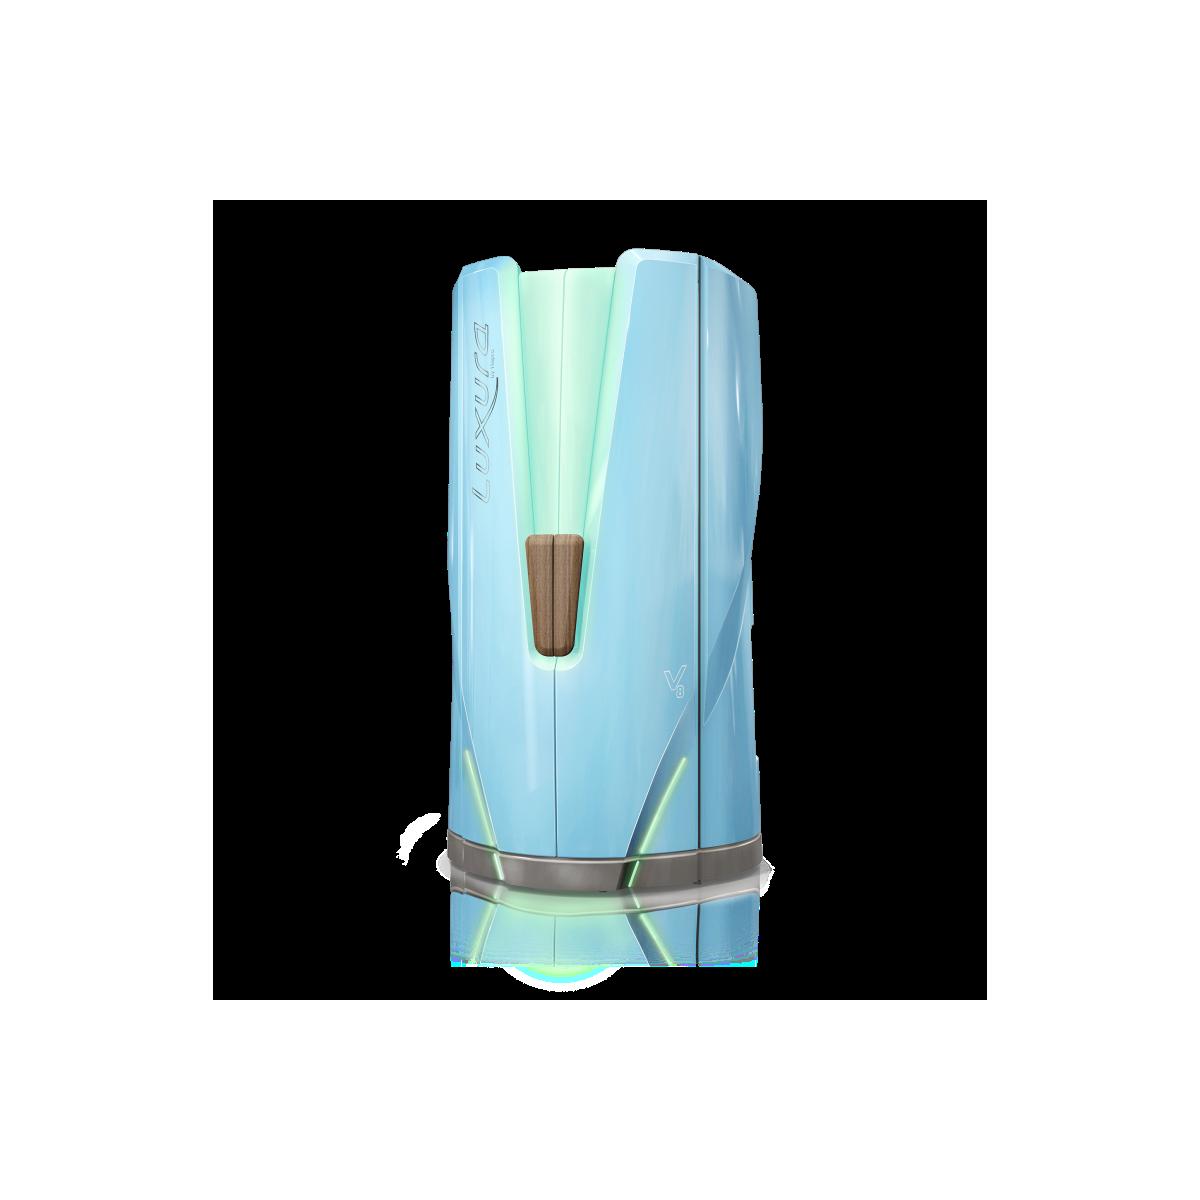 Hapro Luxura V8 48 XL high intensive E power